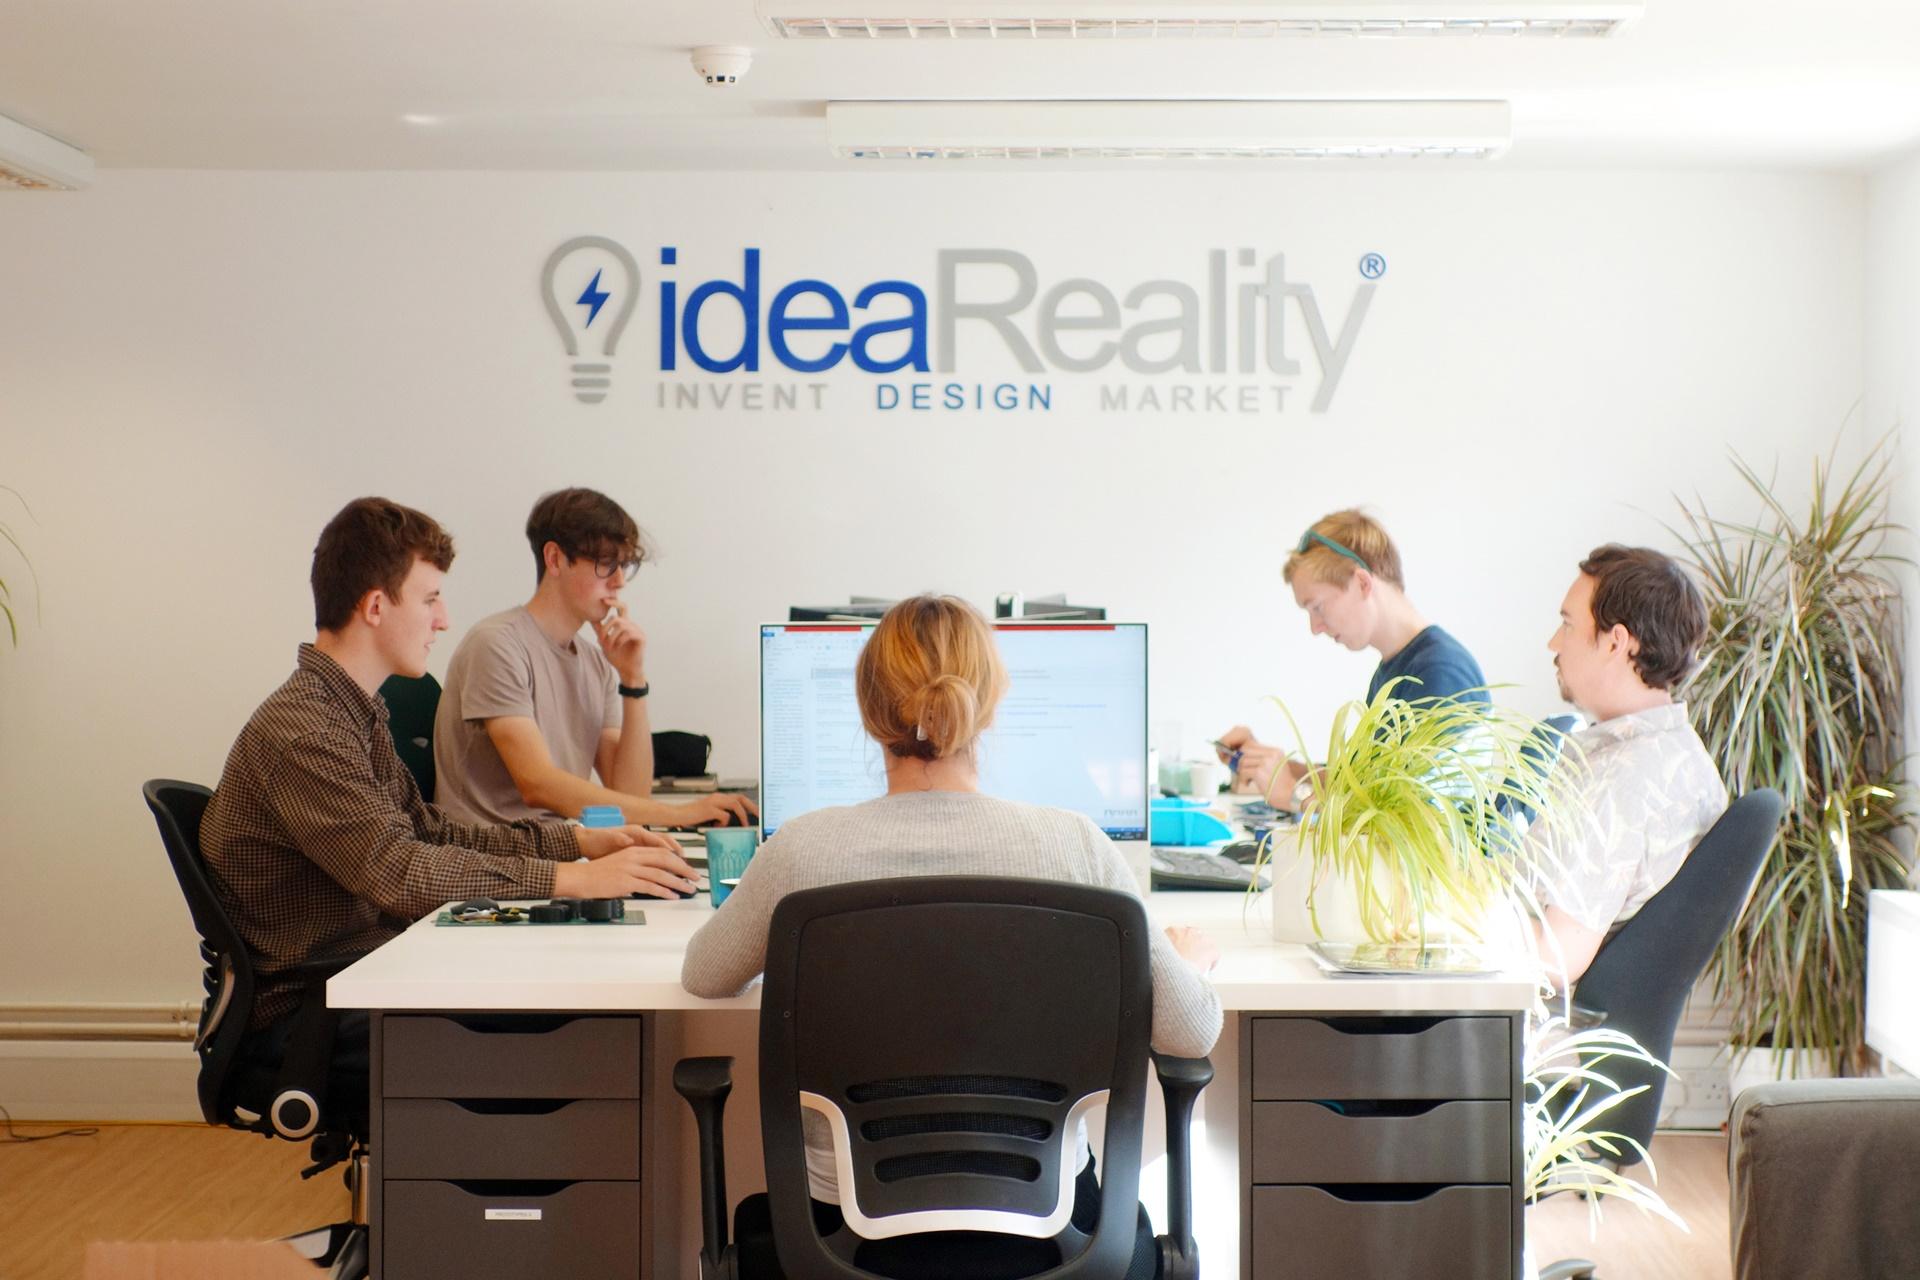 Idea Reality product design team